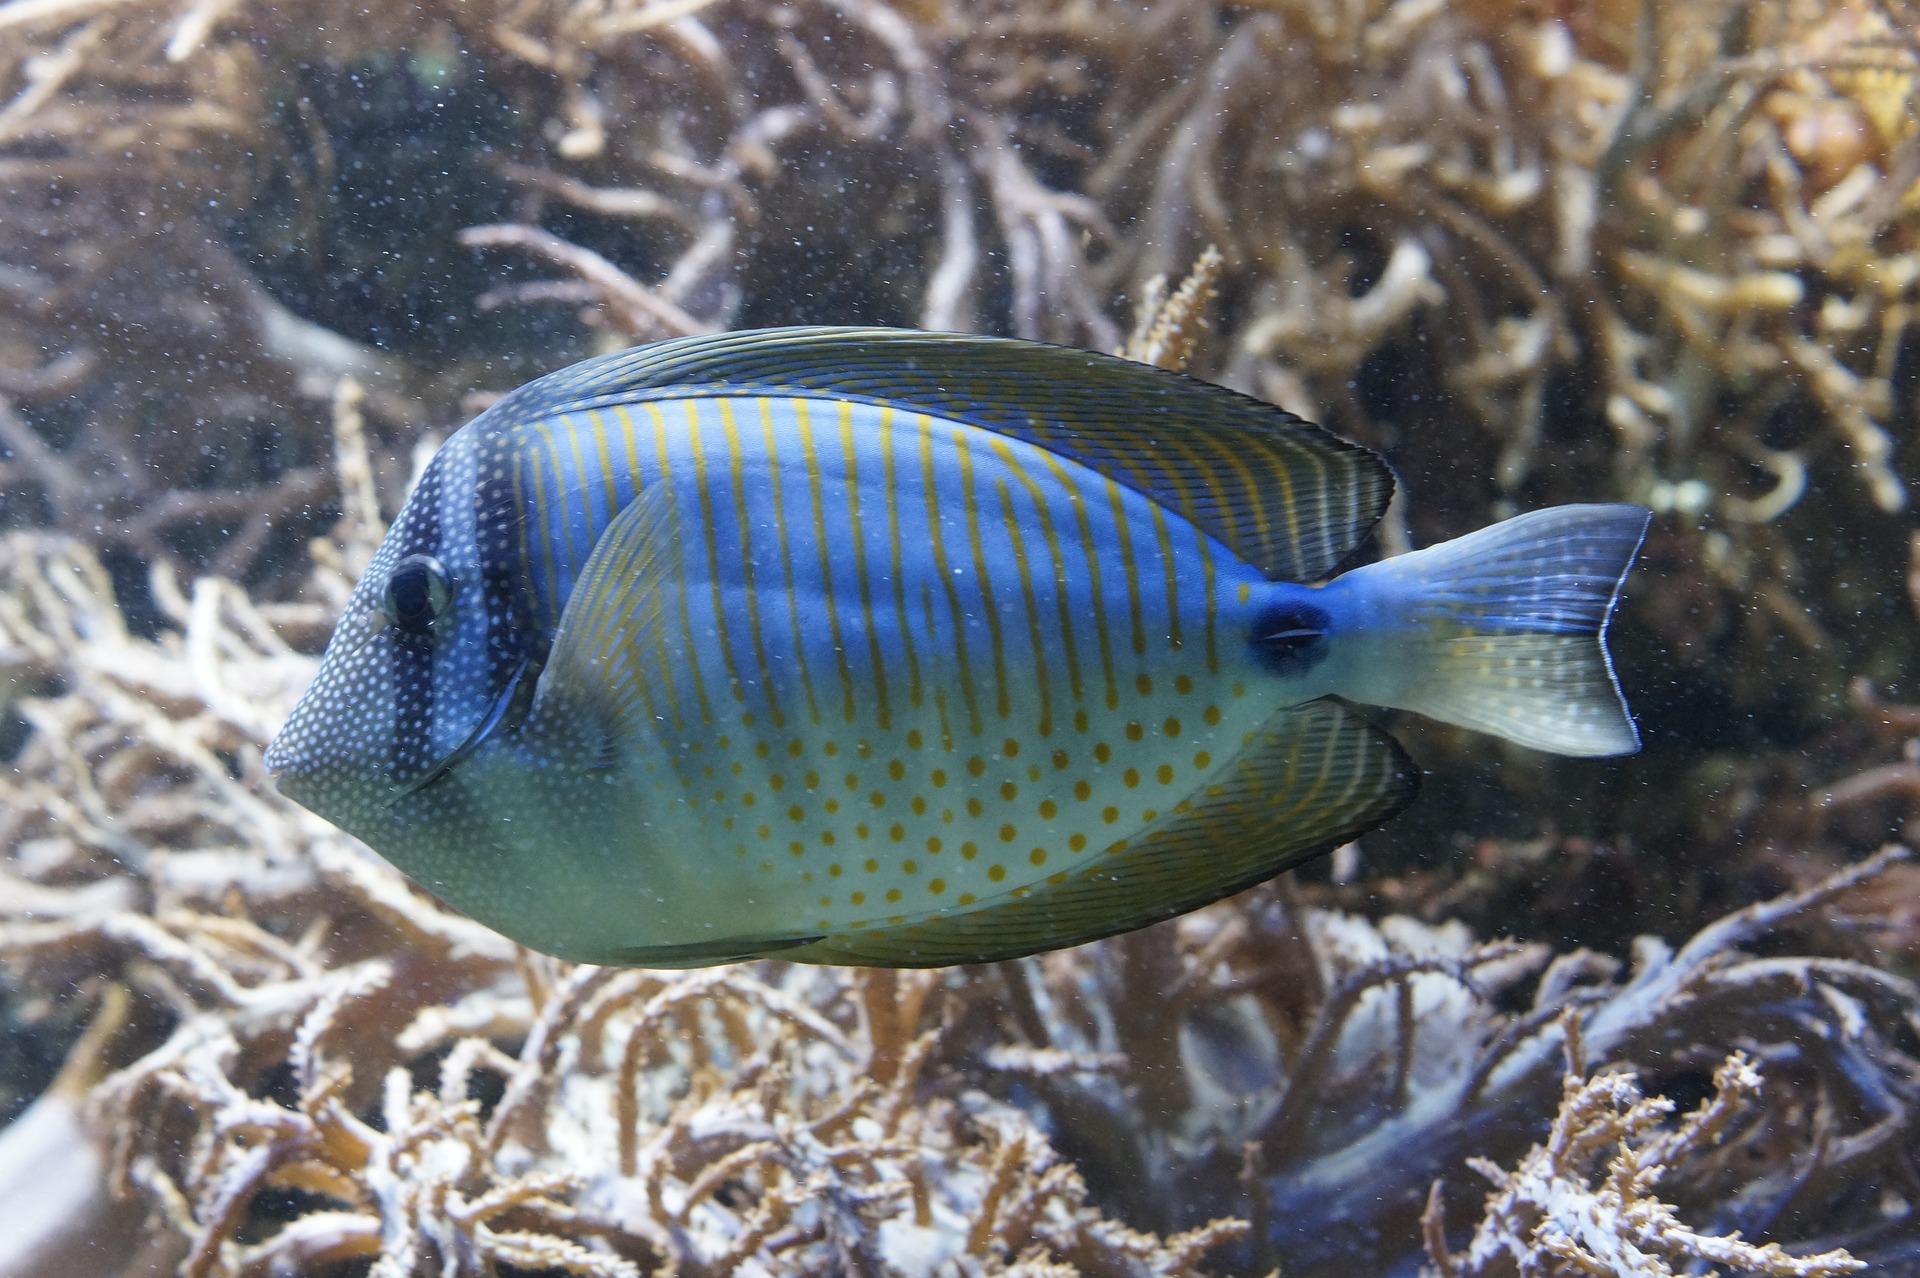 fish-793375_1920.jpg